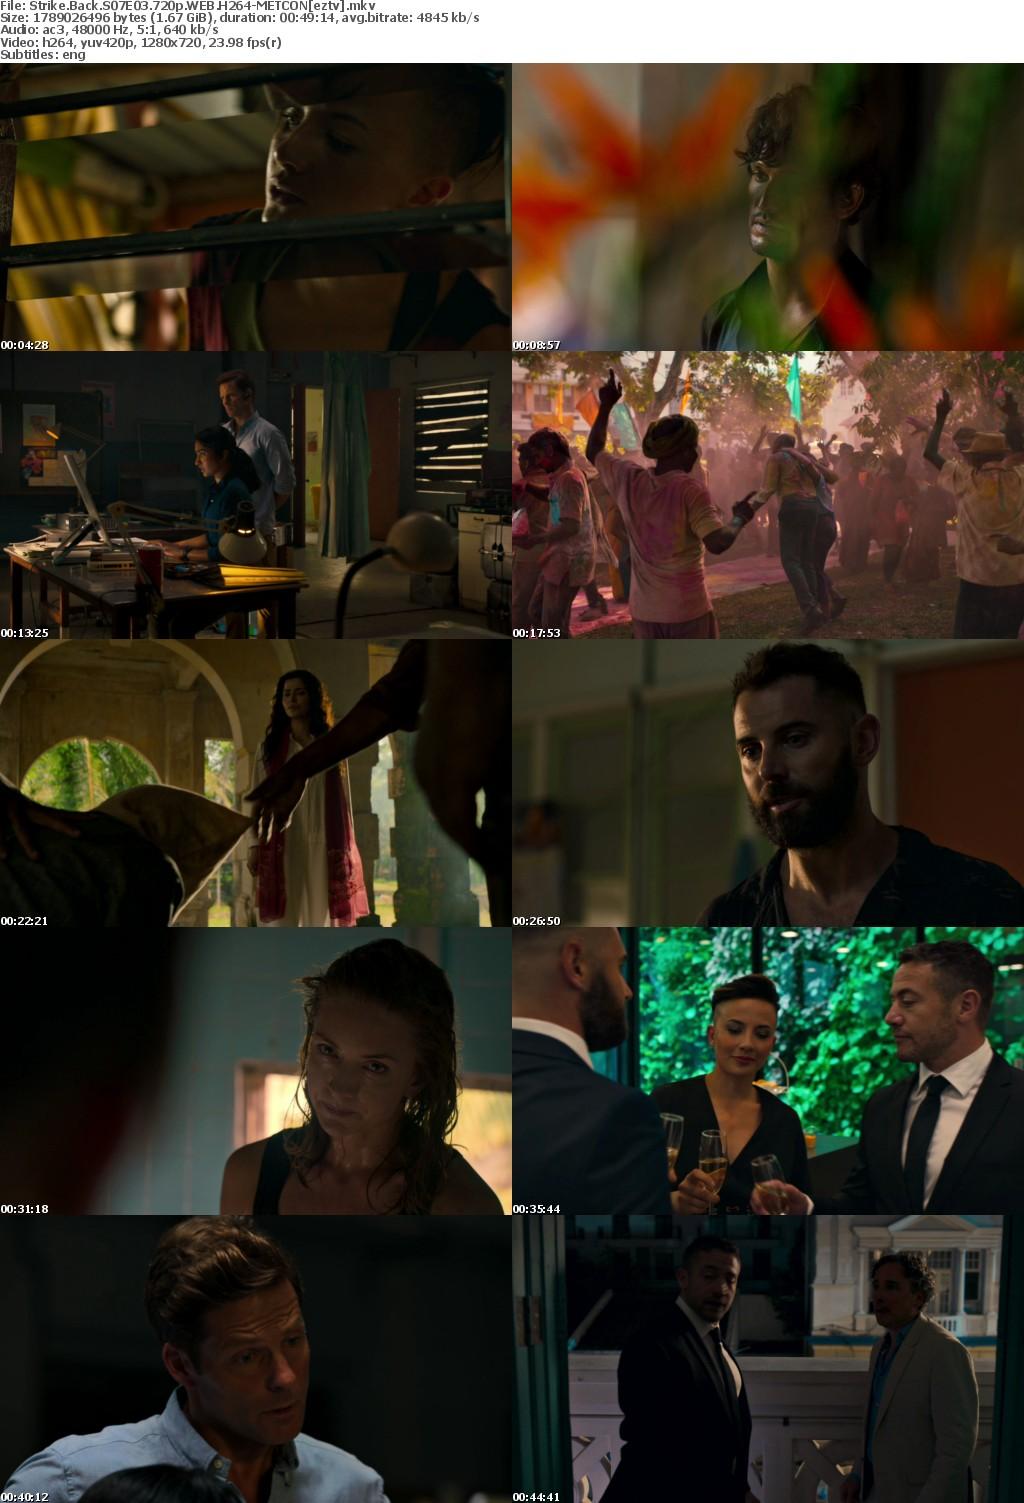 Strike Back S07E03 720p WEB H264-METCON